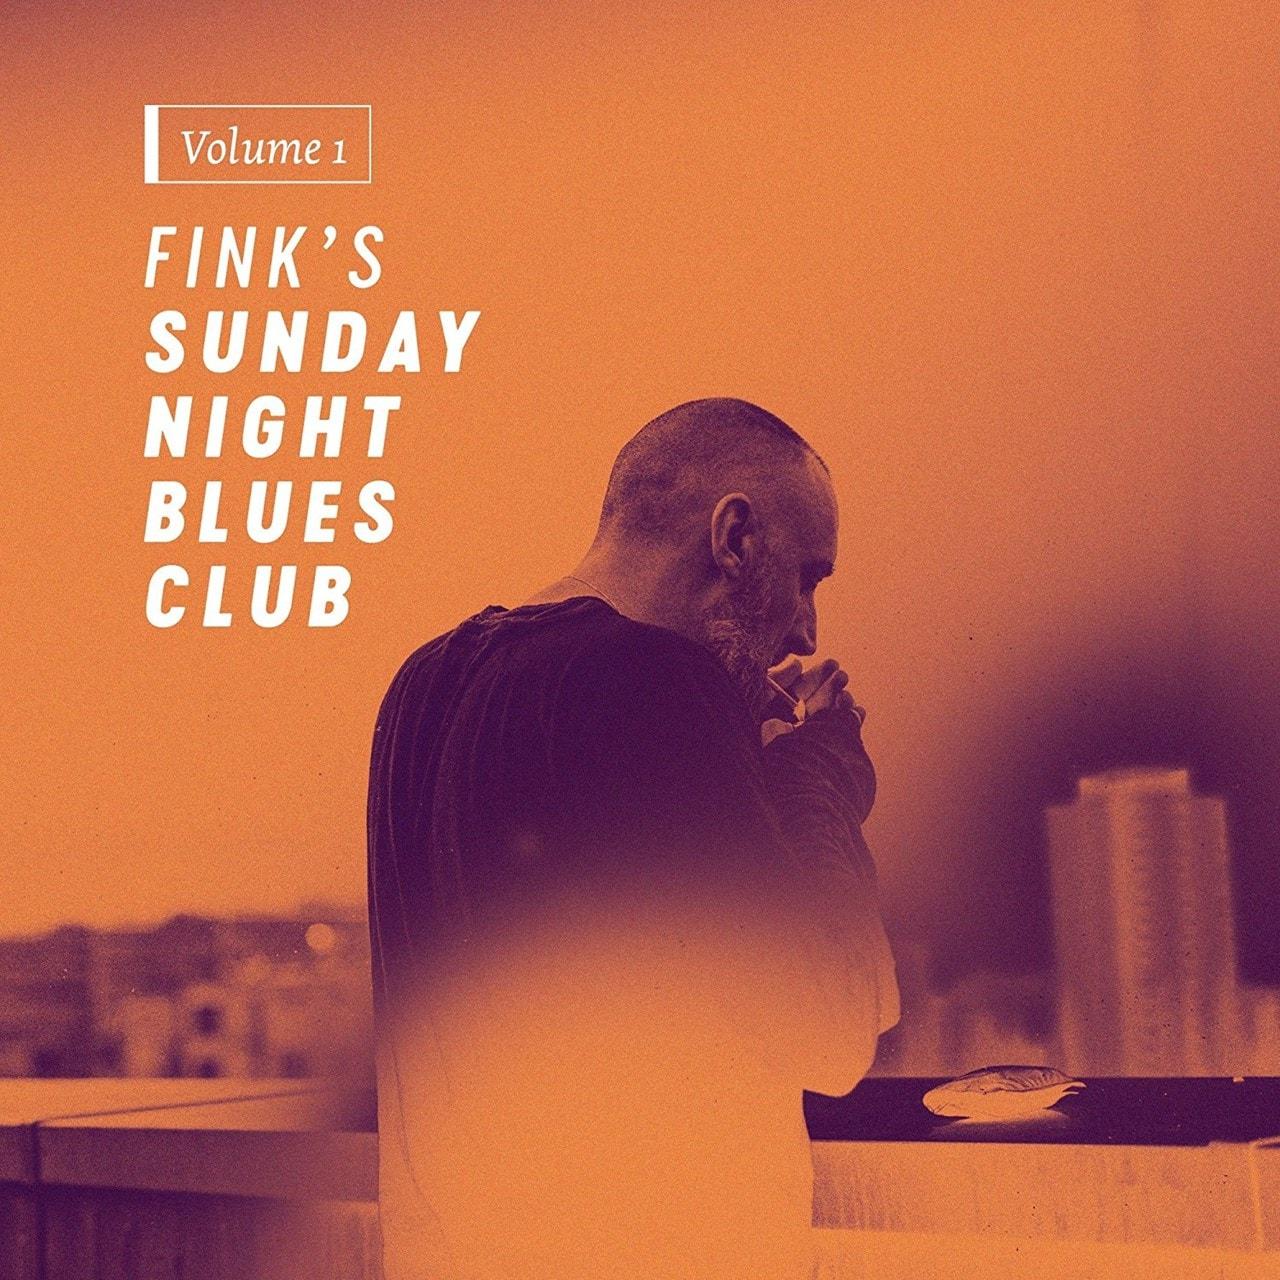 Fink's Sunday Night Blues Club - Volume 1 - 1